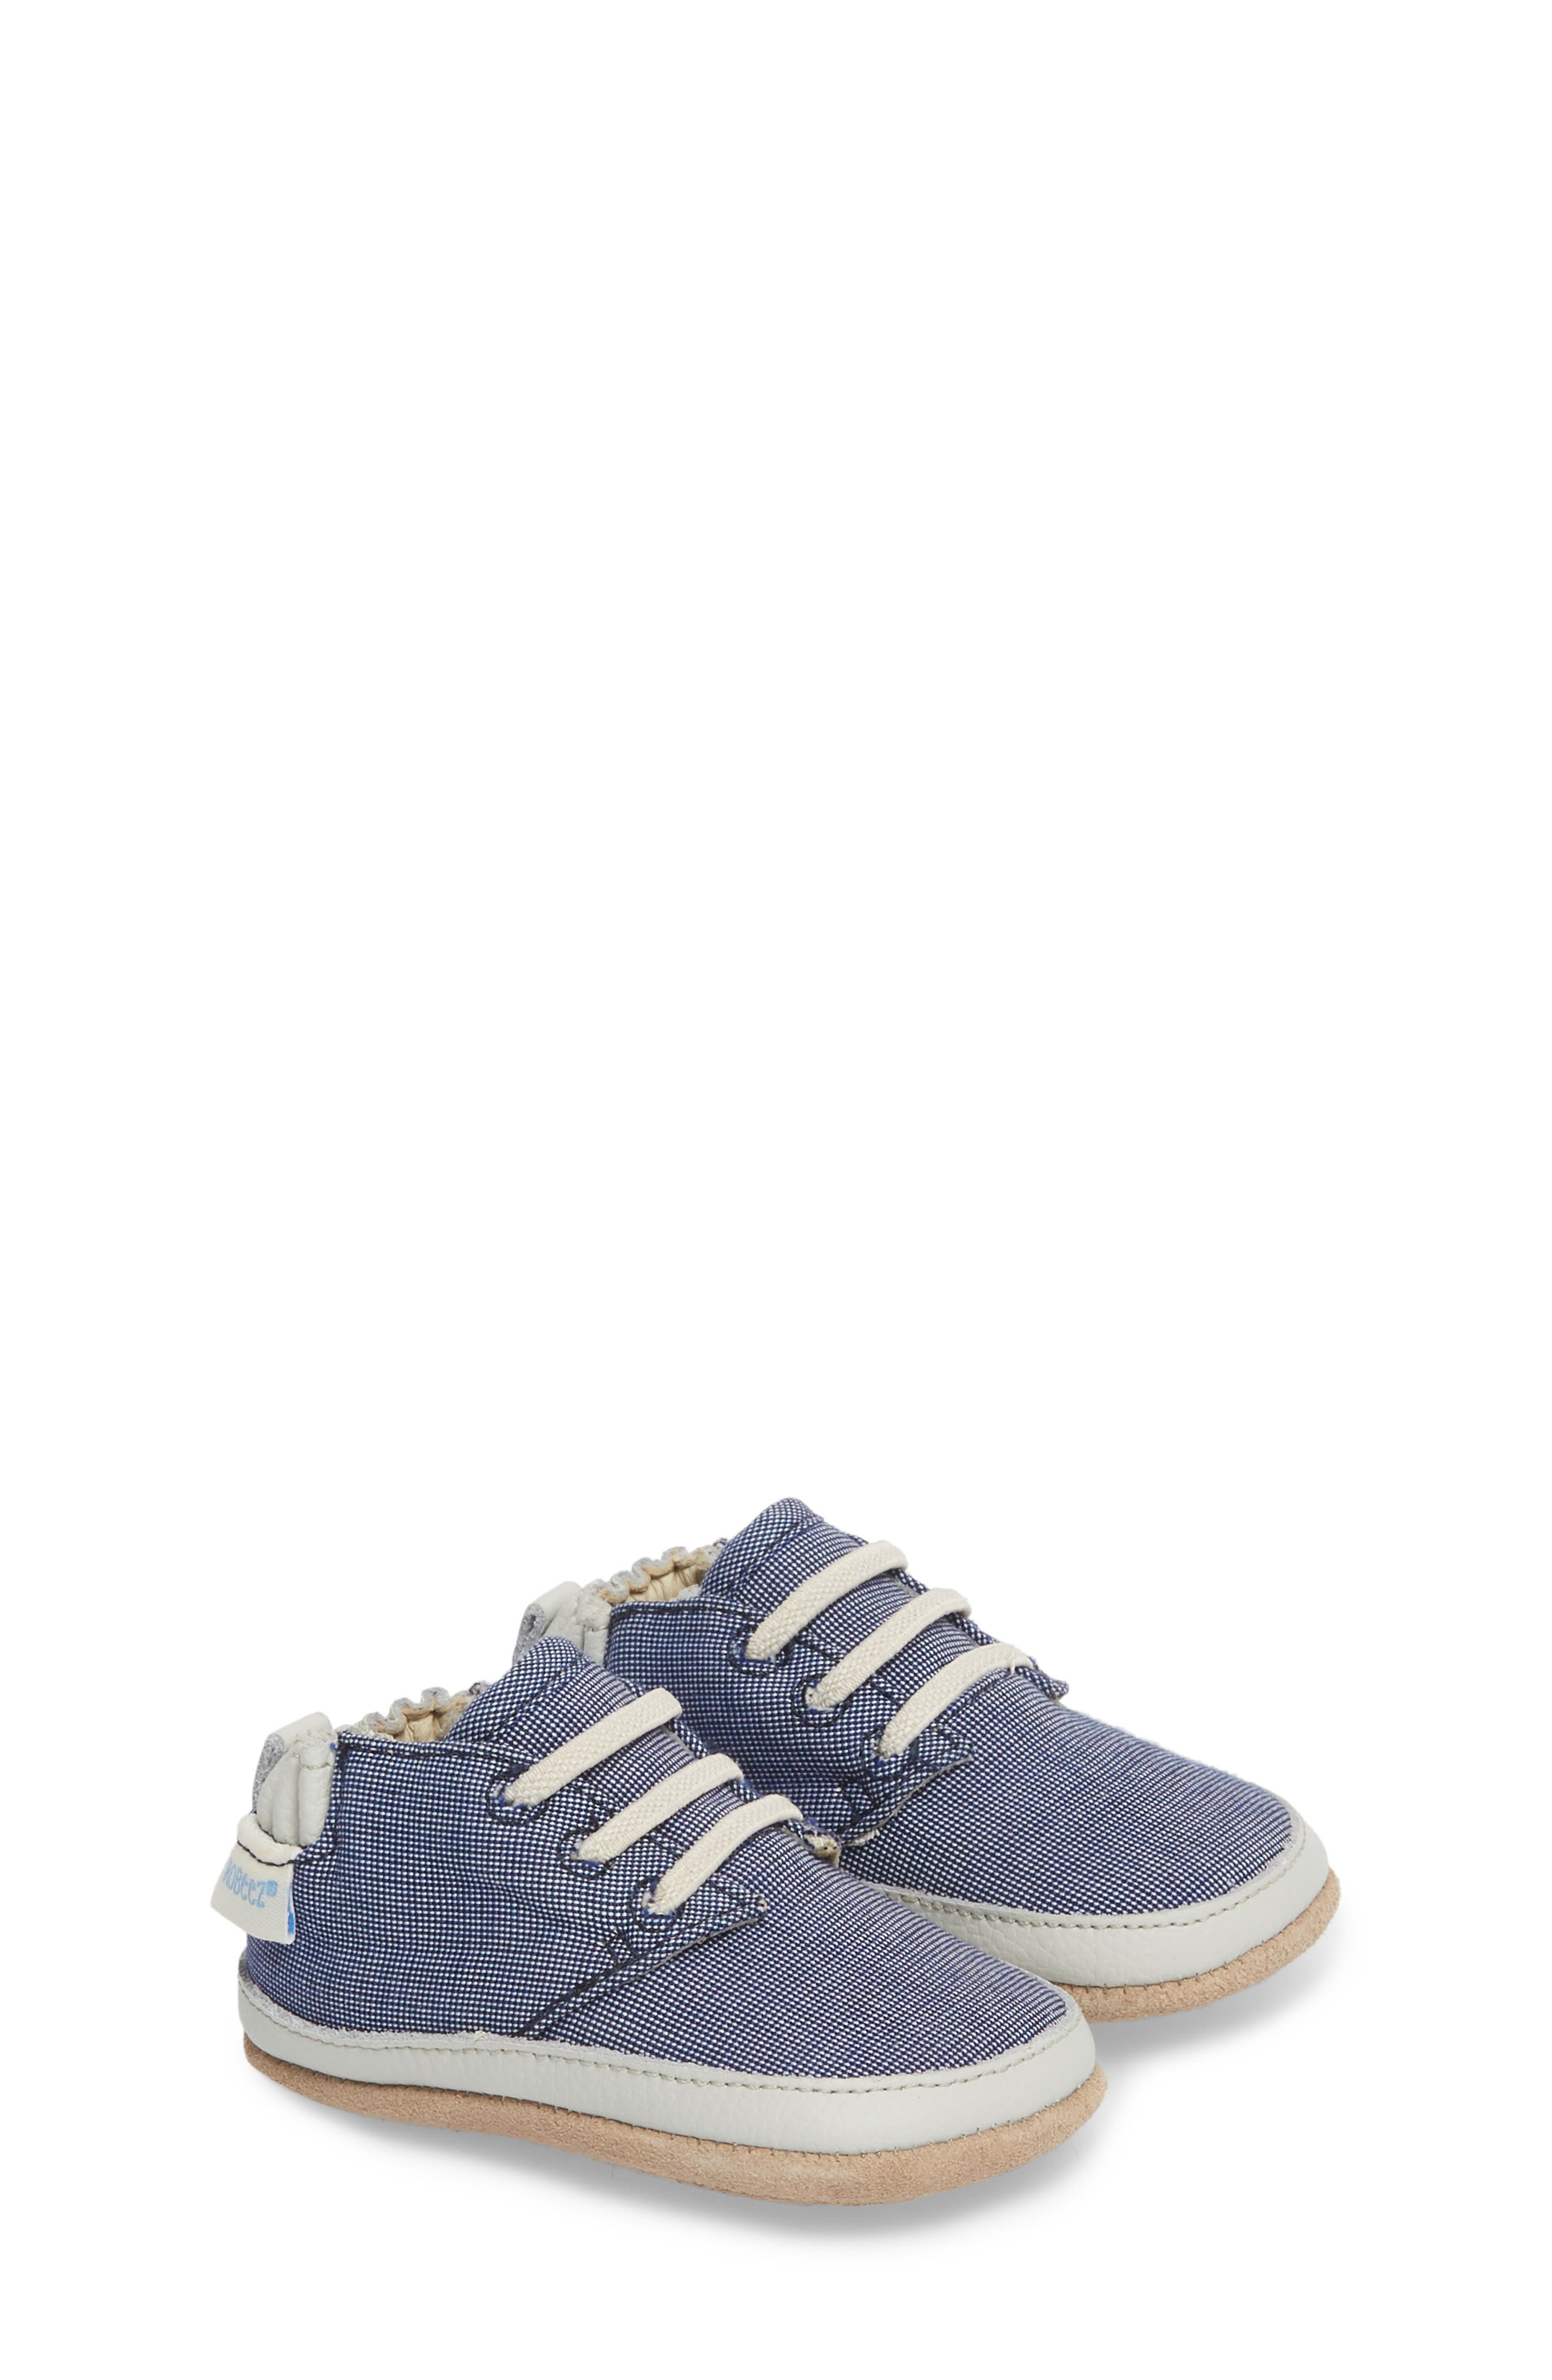 Infant Robeez Steven Crib Sneaker Size 3 M  Blue